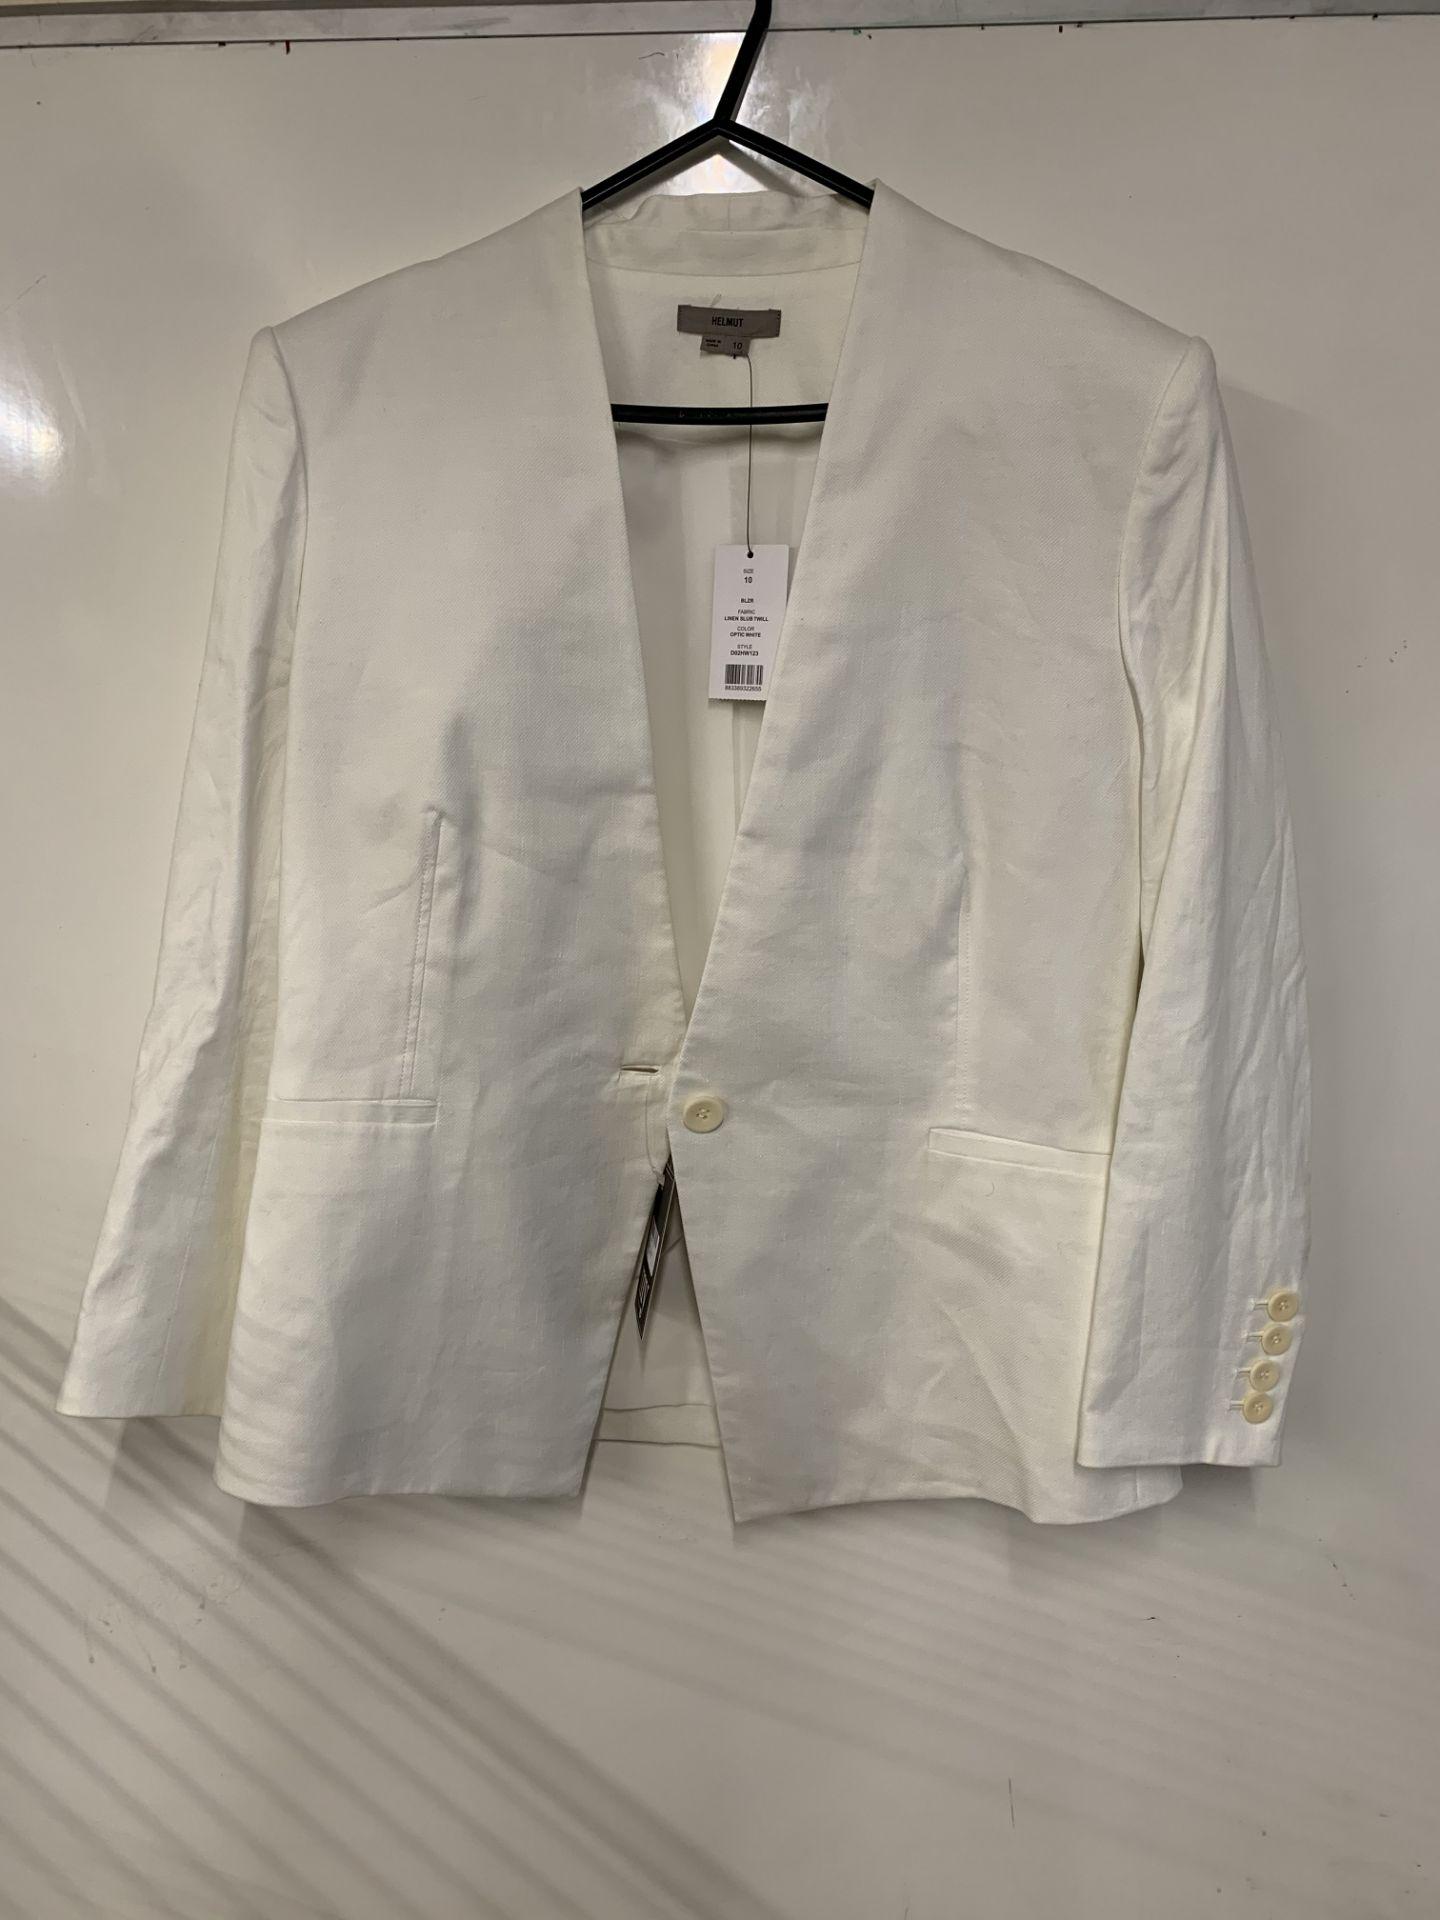 Lot 25 - Helmut Lang linen slub twill blazer | RRP £355.00